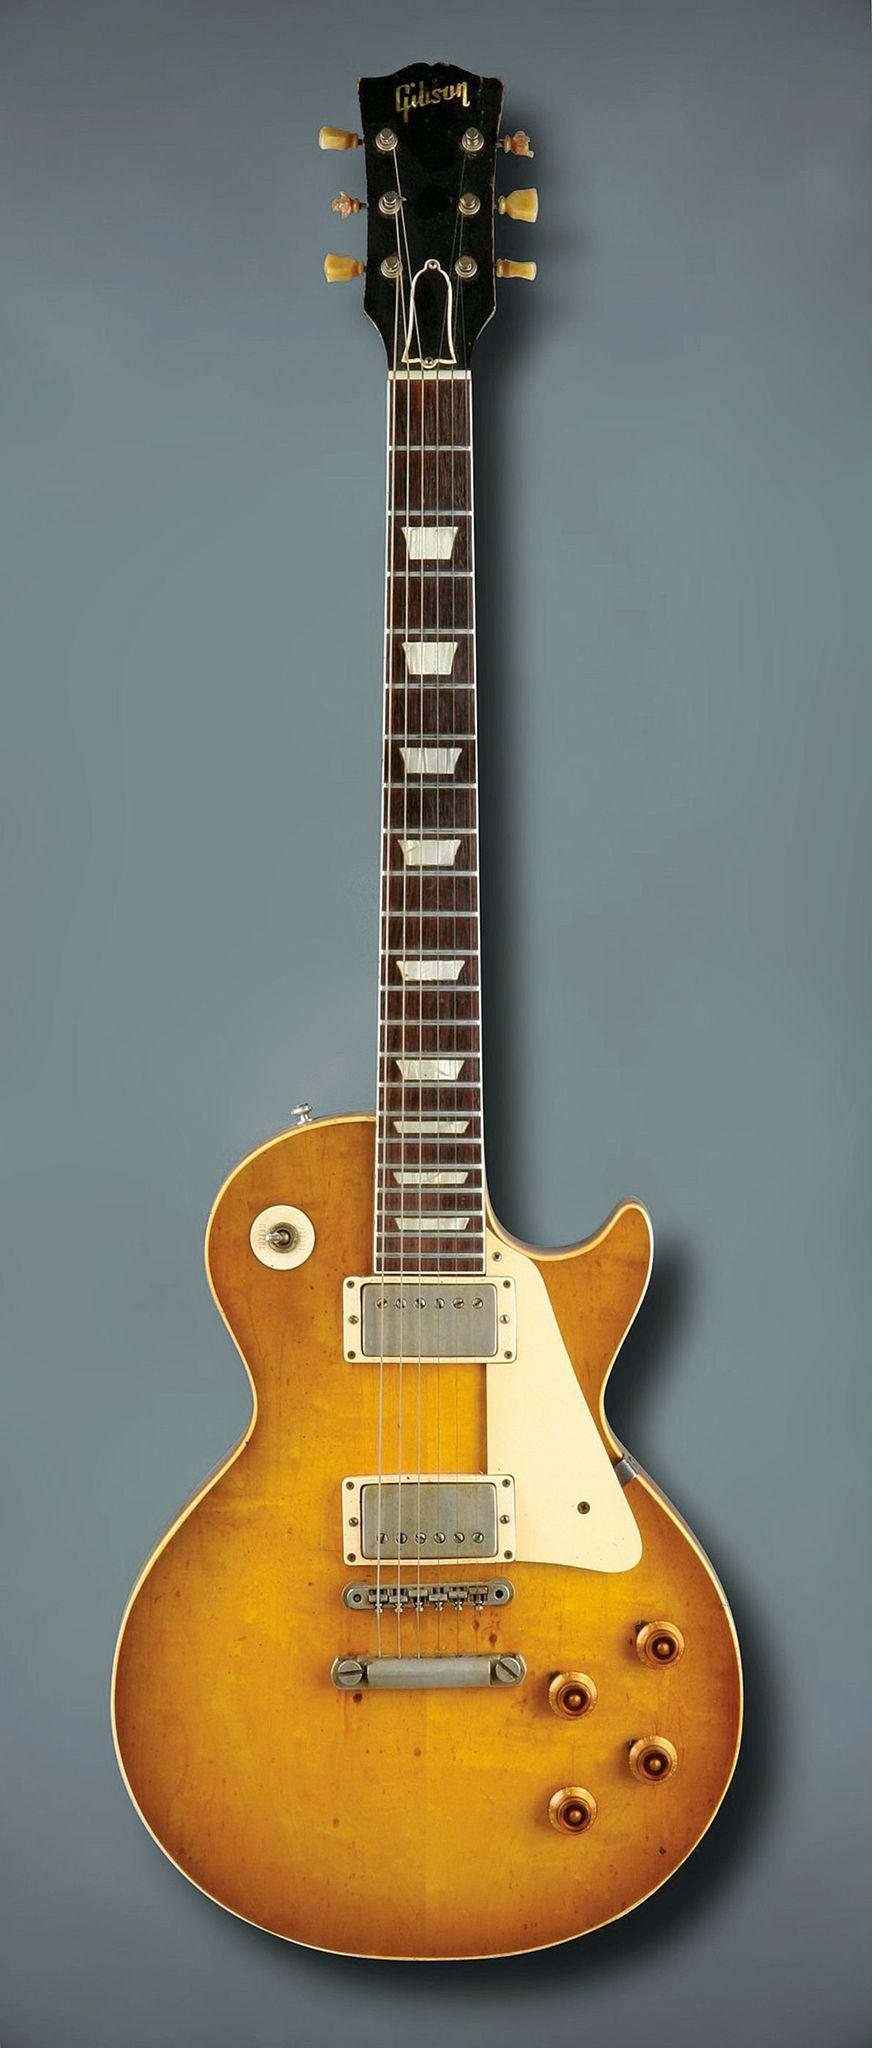 1959 Gibson Les Paul #gibsonguitars